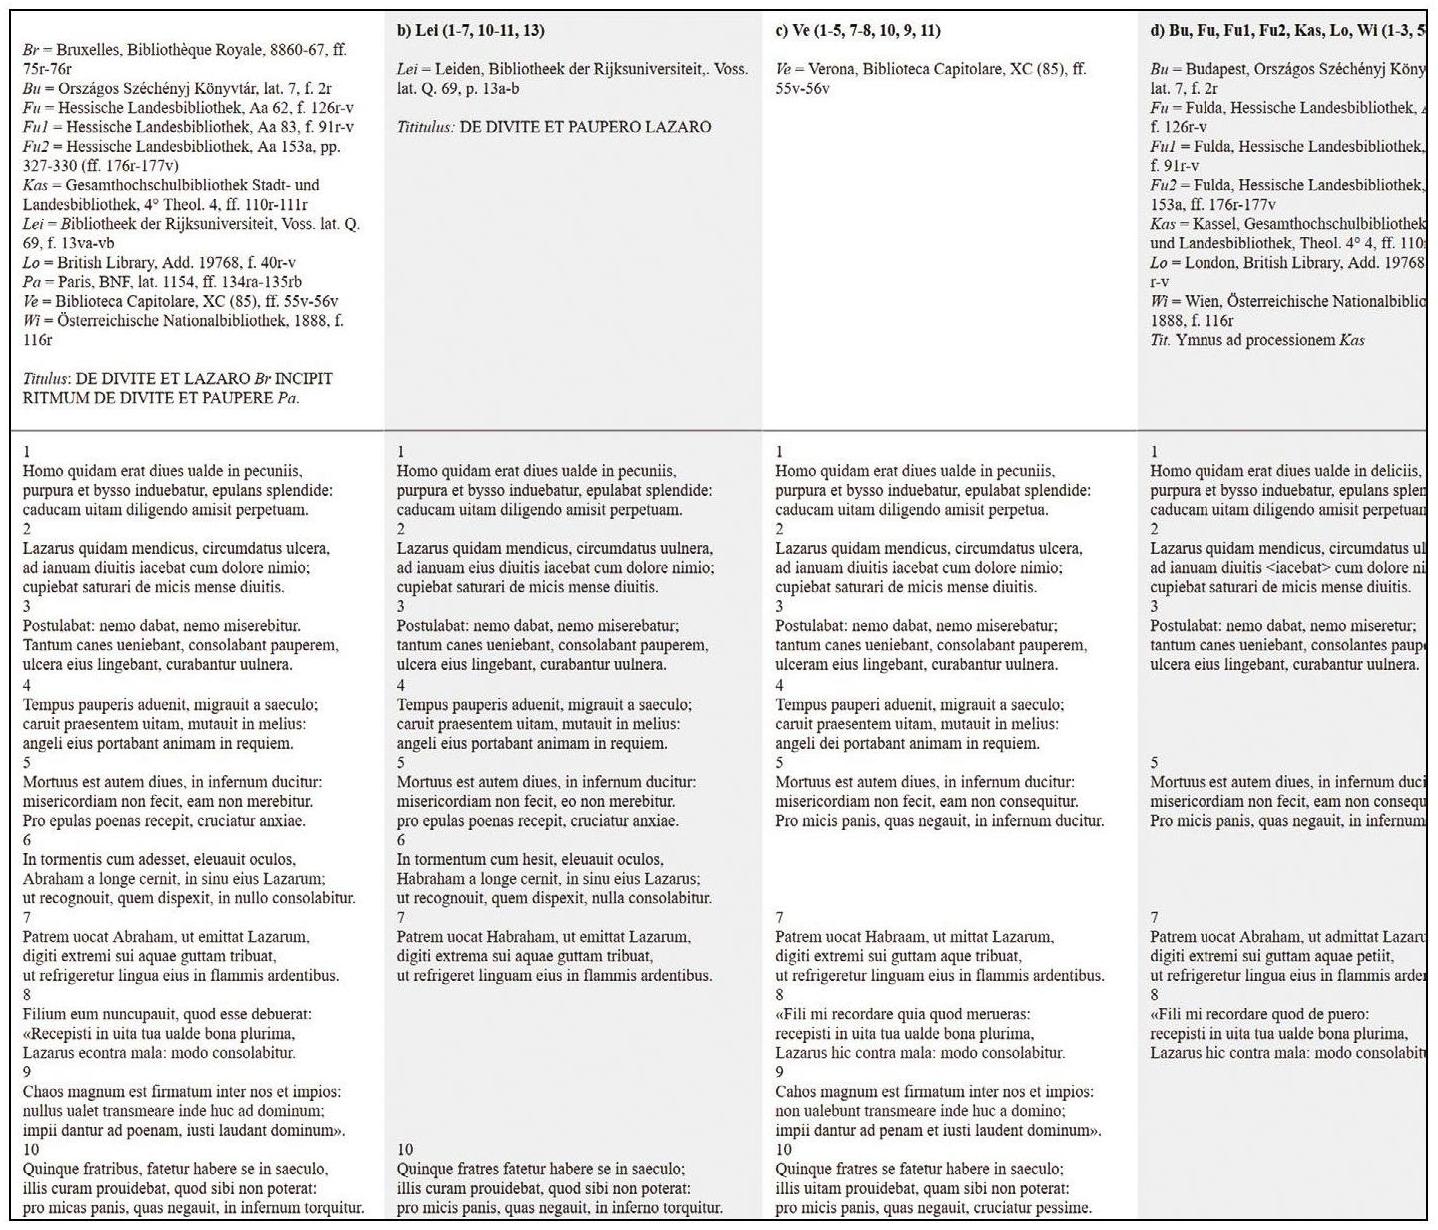 digital scholarly editing 4 a protocol for scholarly digital